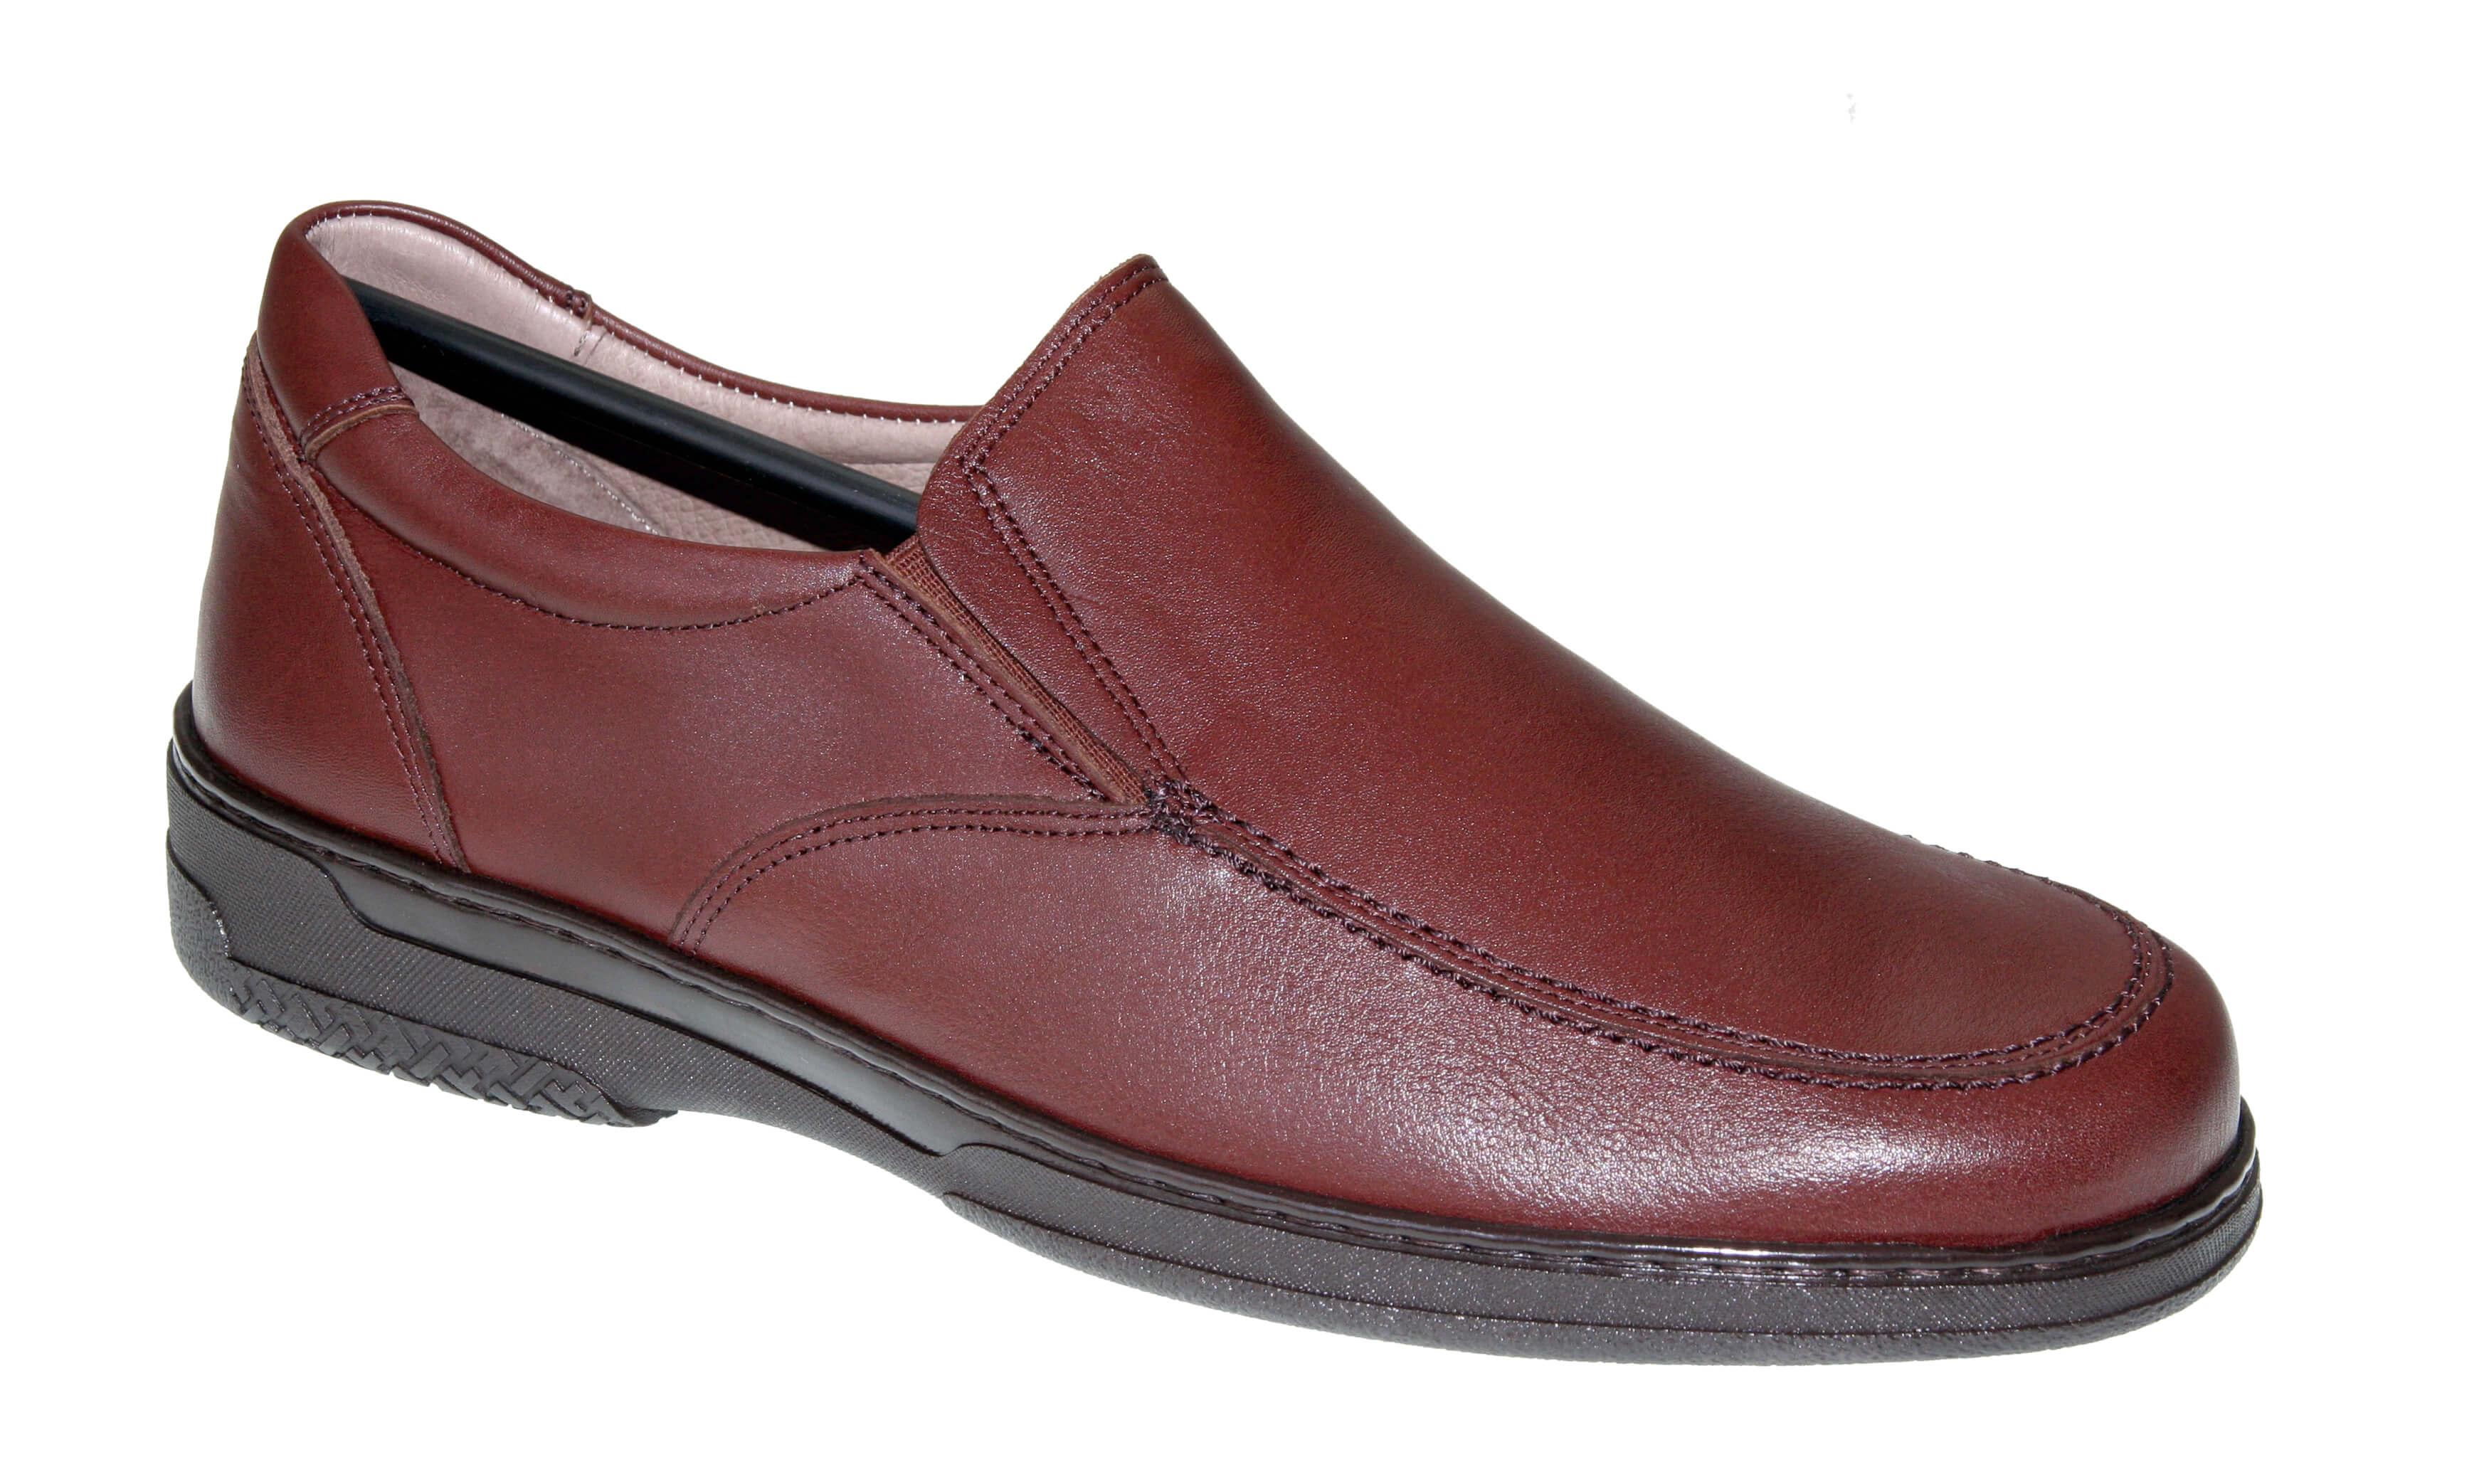 Calzado ancho pies delicados modelo 6991M